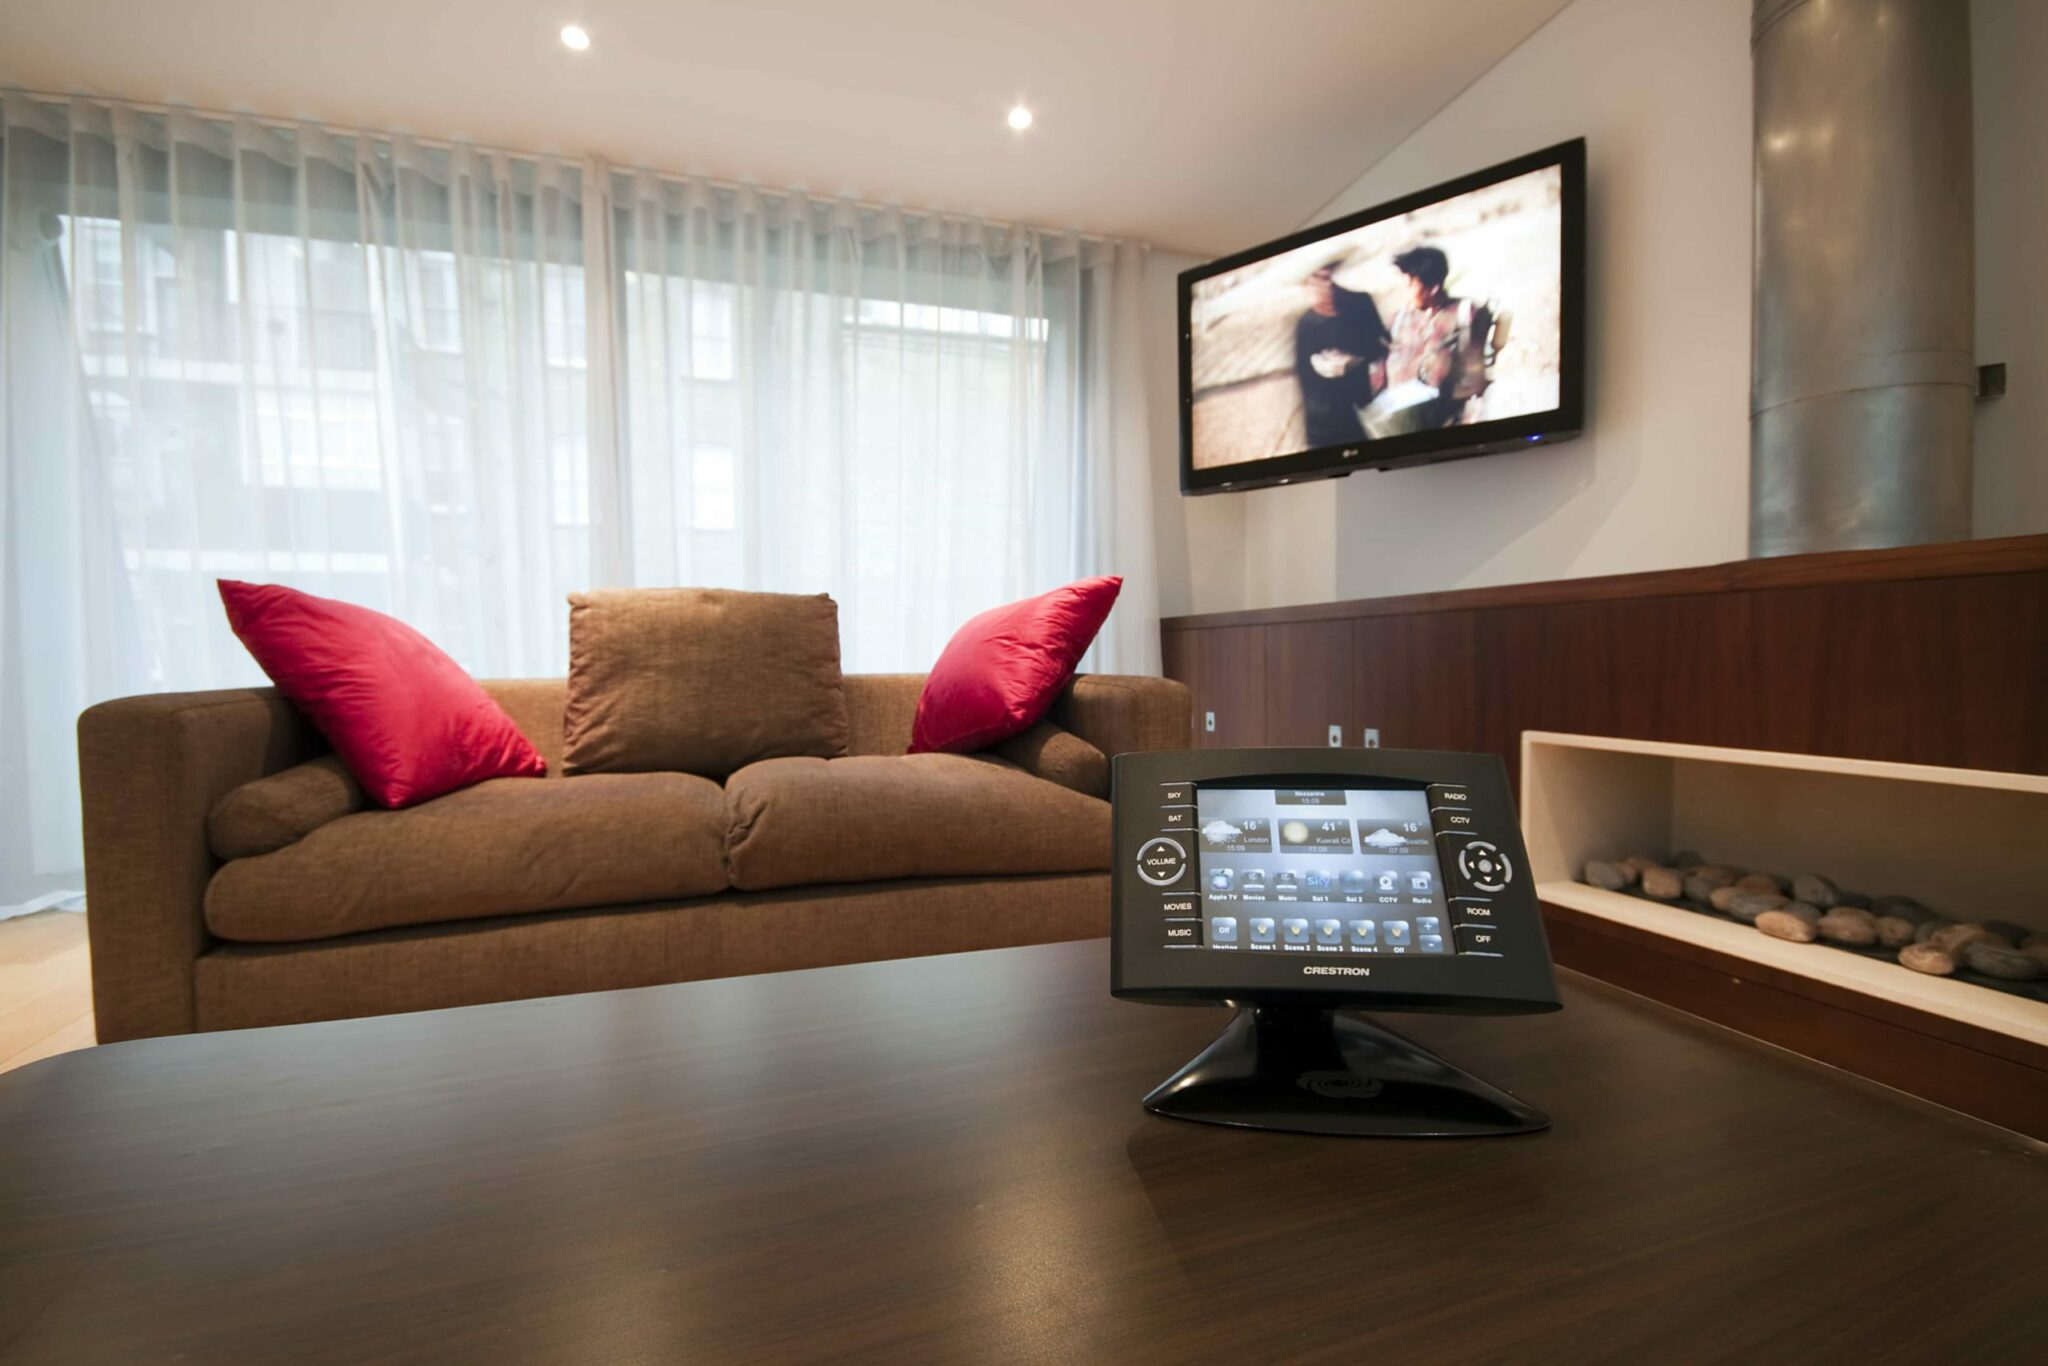 Crestron Control in Living Room, Baker St